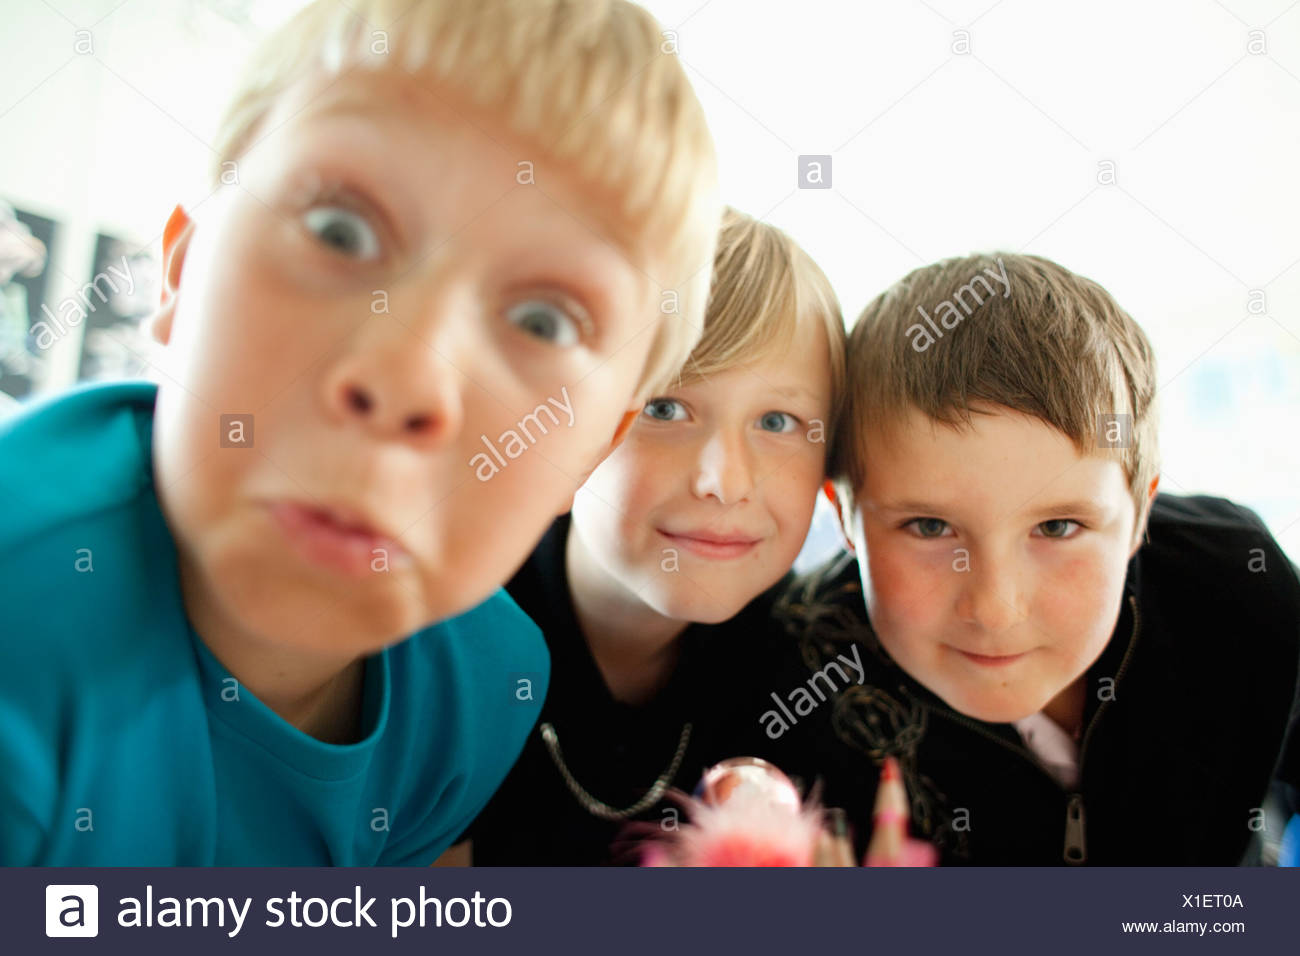 Three boys grimacing - Stock Image